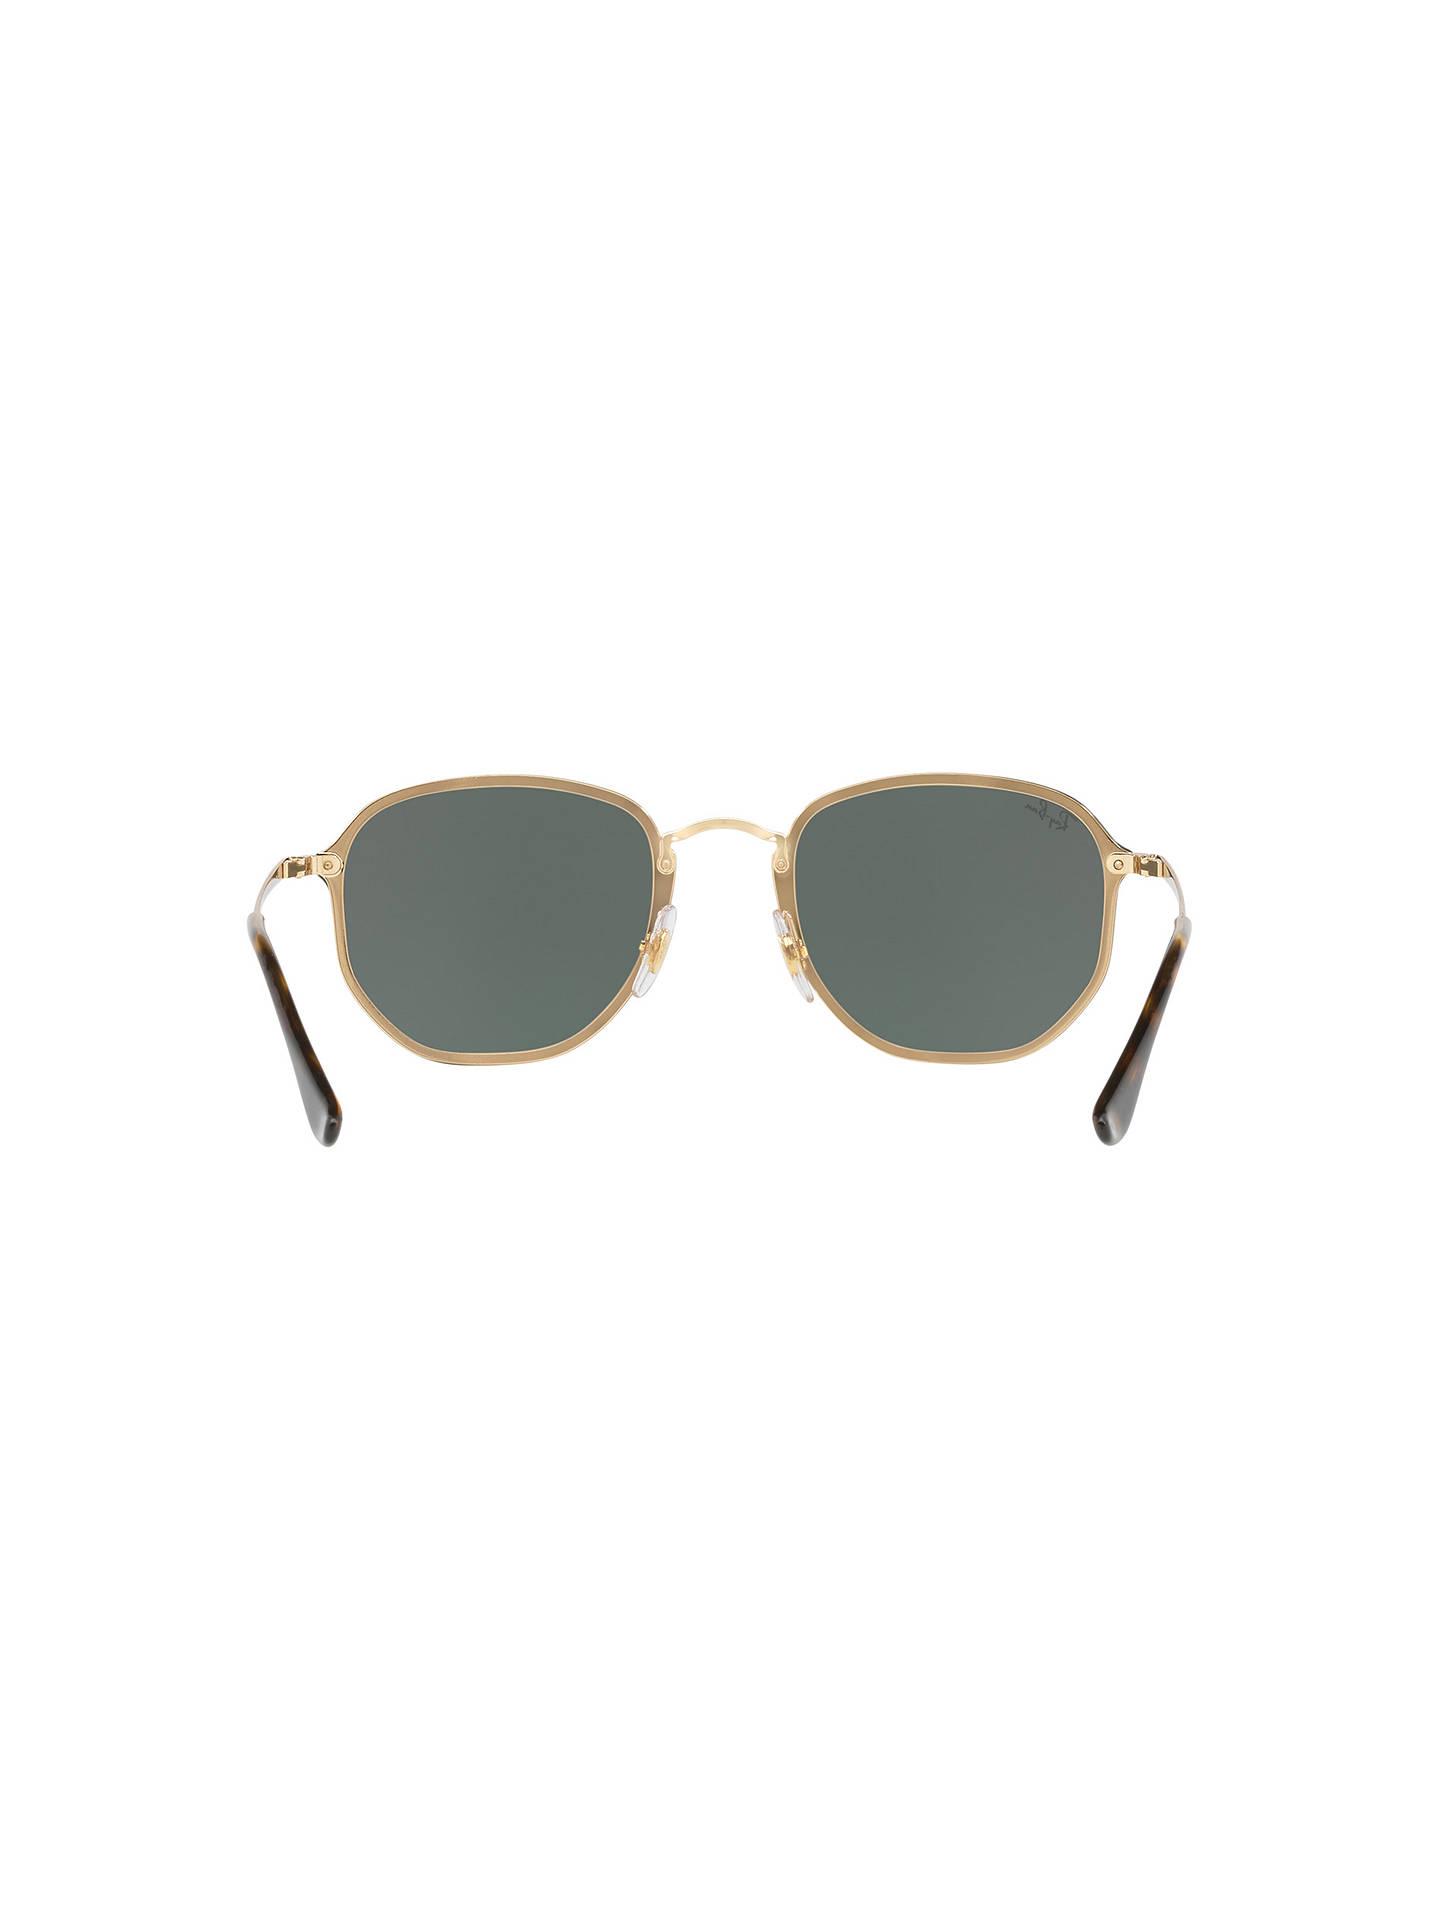 c888988d38f Buy Ray-Ban RB3579N Blaze Hexagonal Sunglasses